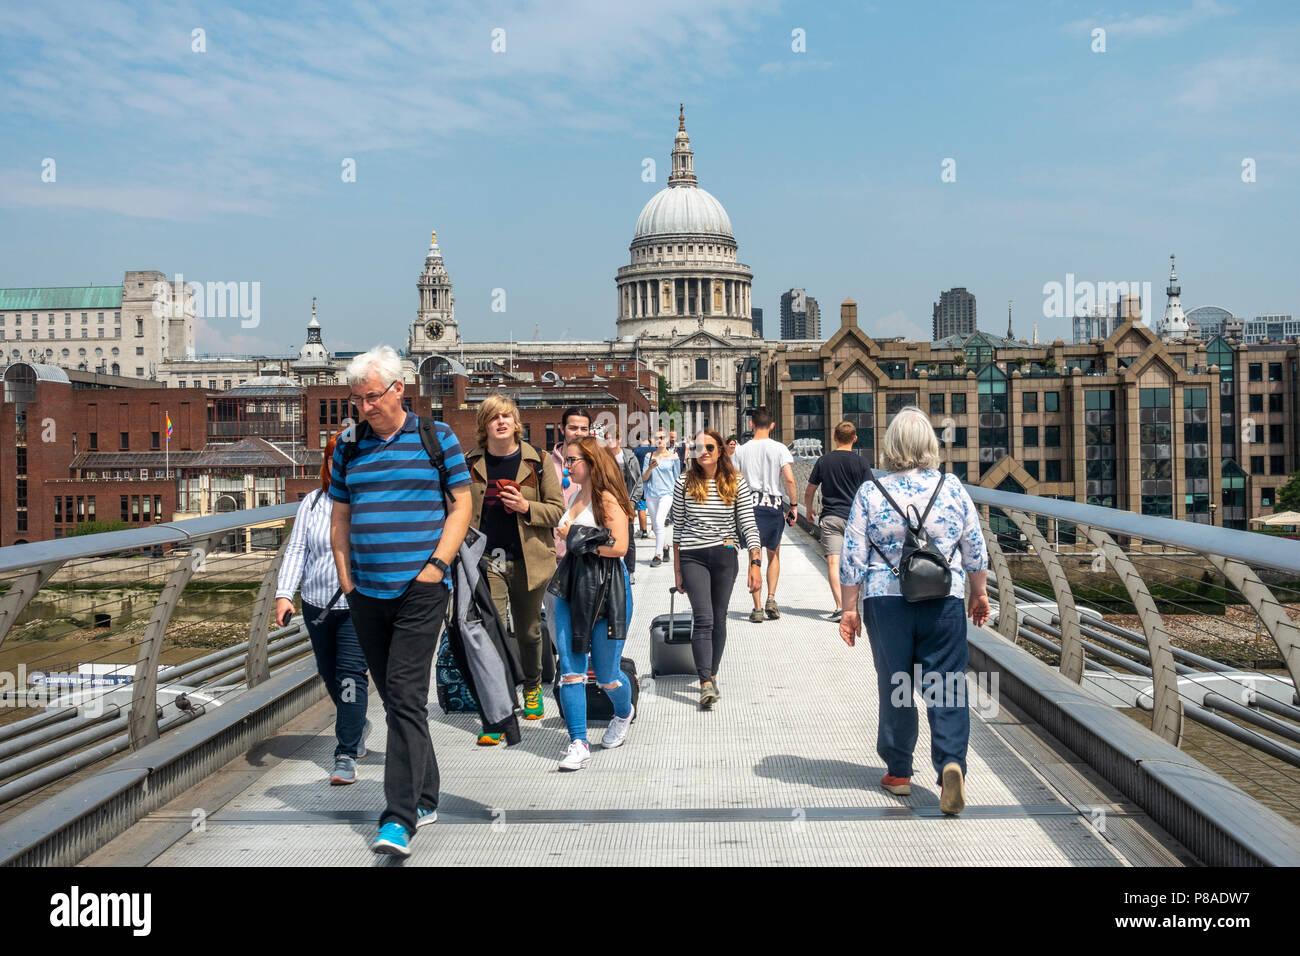 Passengers crossing the London Millennium Footbridge / Millennium Bridge over the River Thames towards St Paul's Cathedral in central London, England - Stock Image